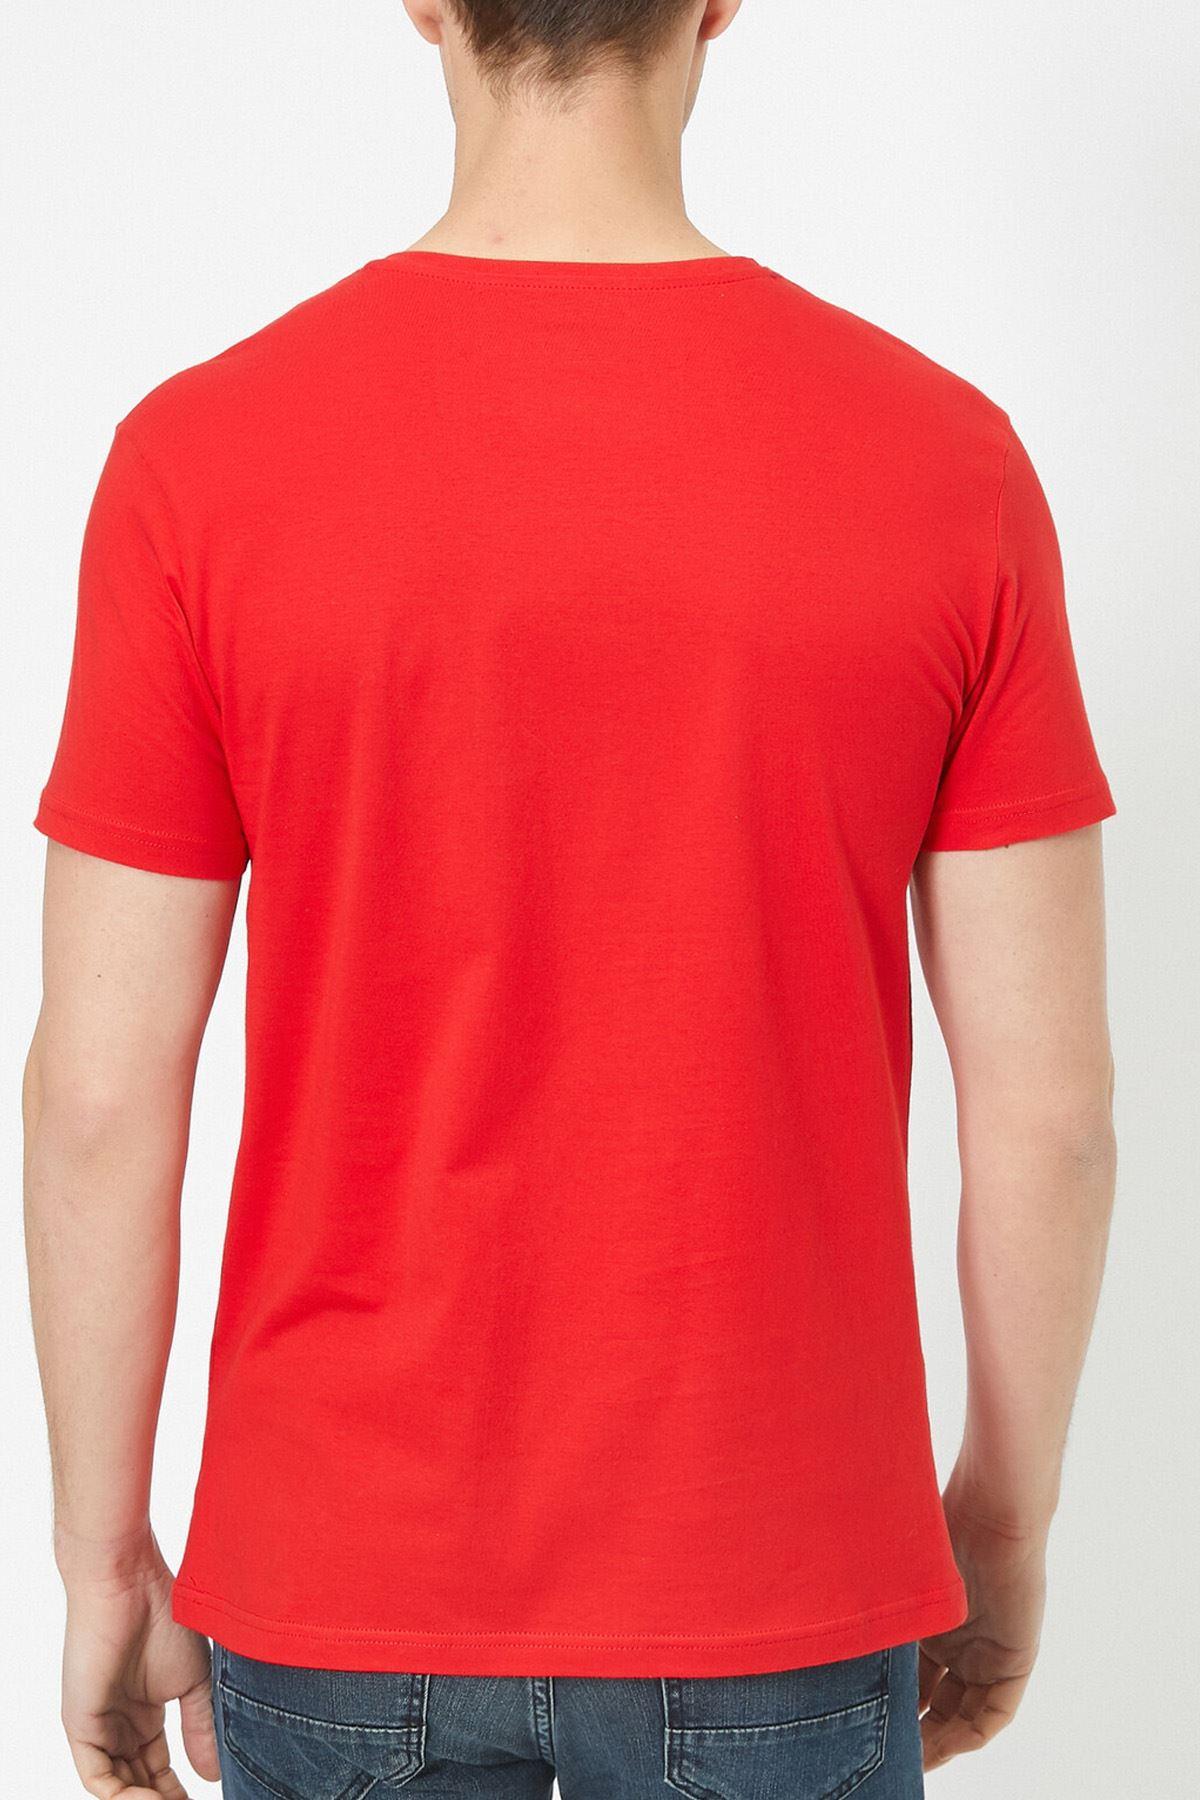 Naruto Anime 02 Kırmızı Erkek Tshirt - Tişört